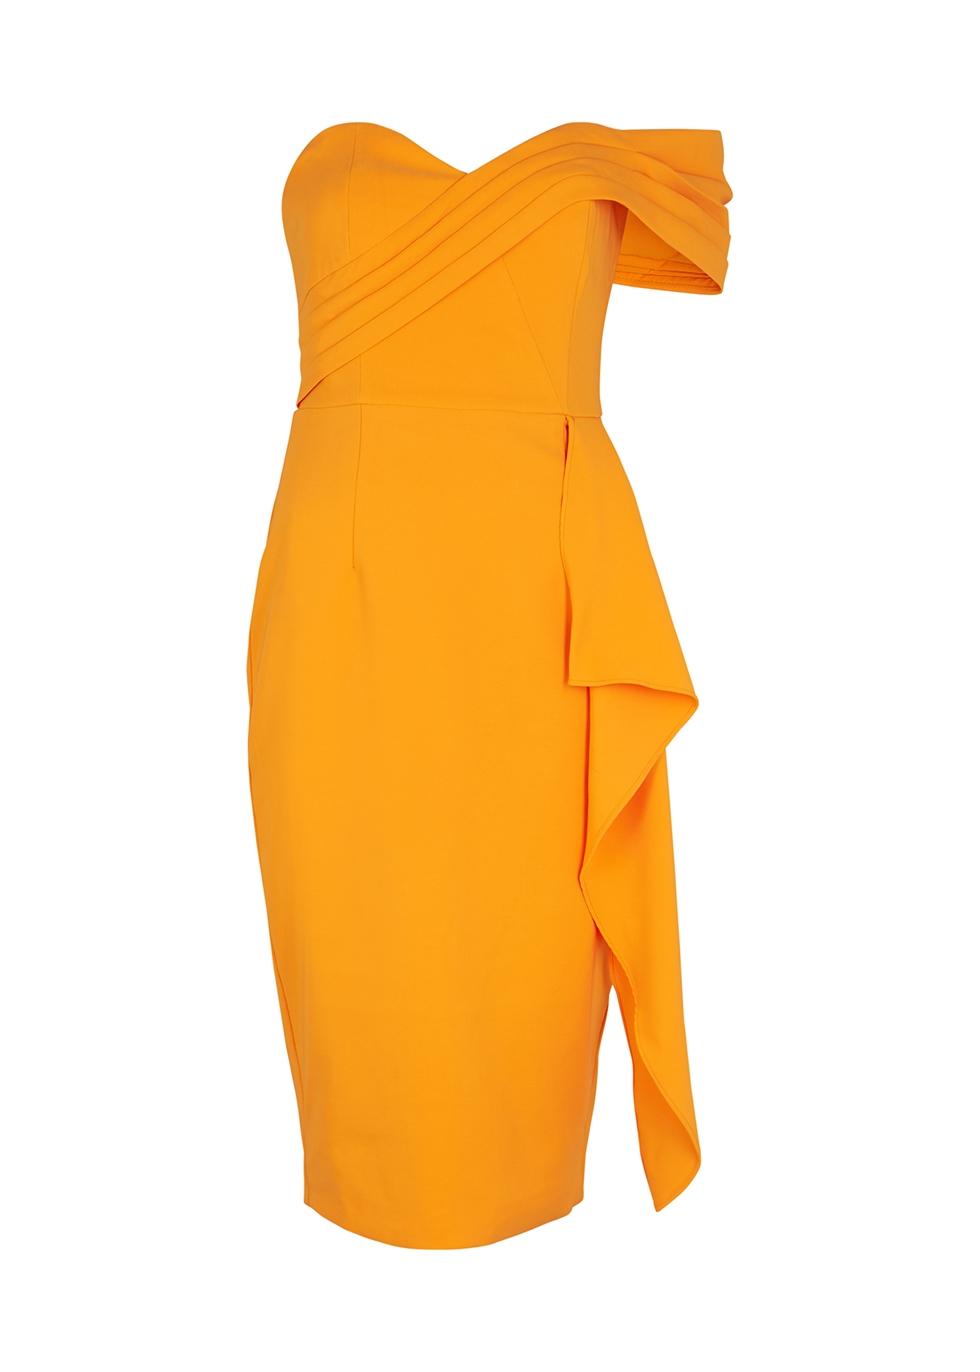 Orange one-shoulder midi dress